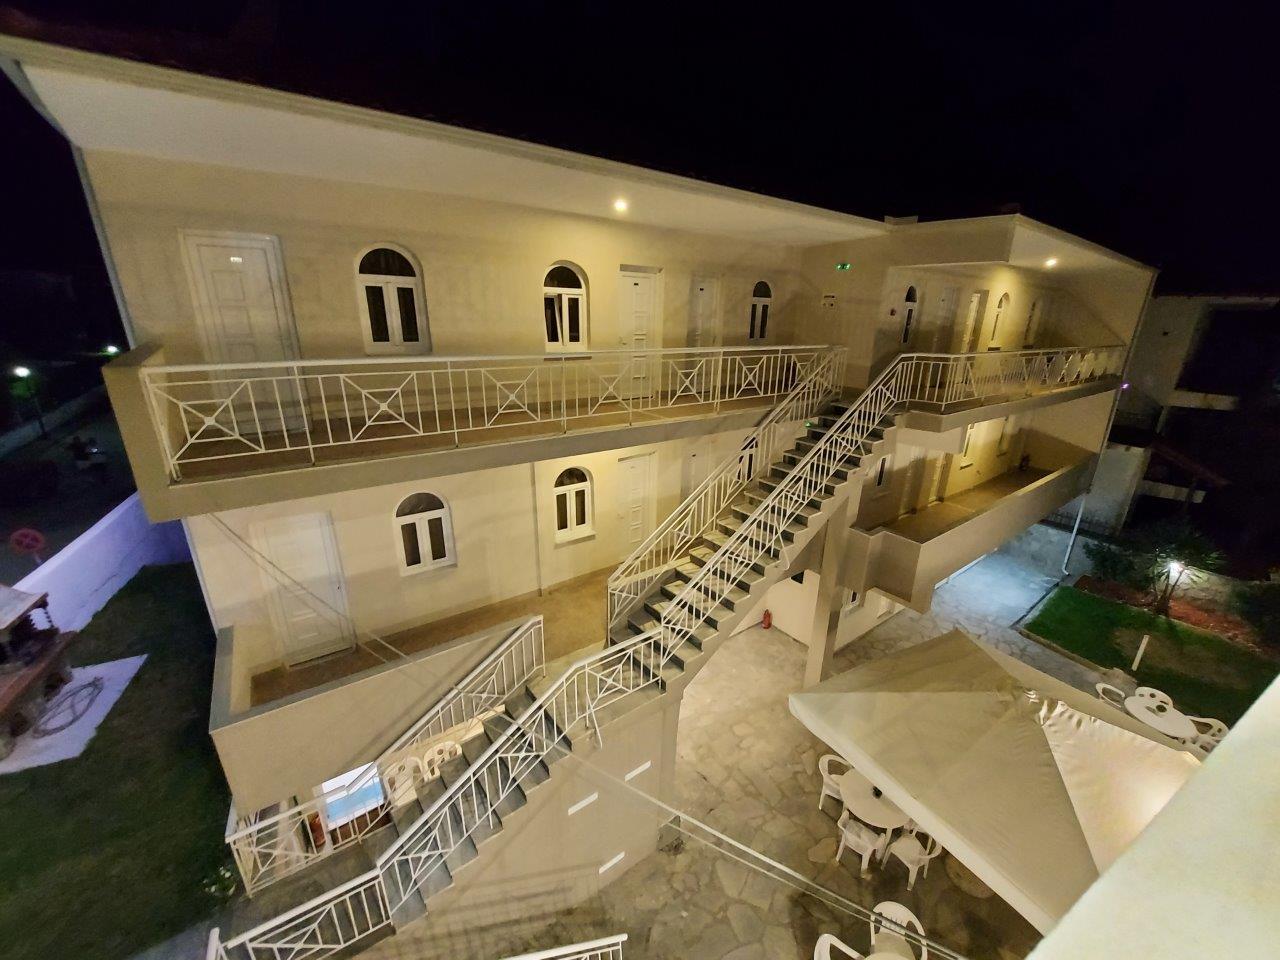 Grcka apartmani letovanje, Polihrono Halkidiki, Green Gardens, kuća A